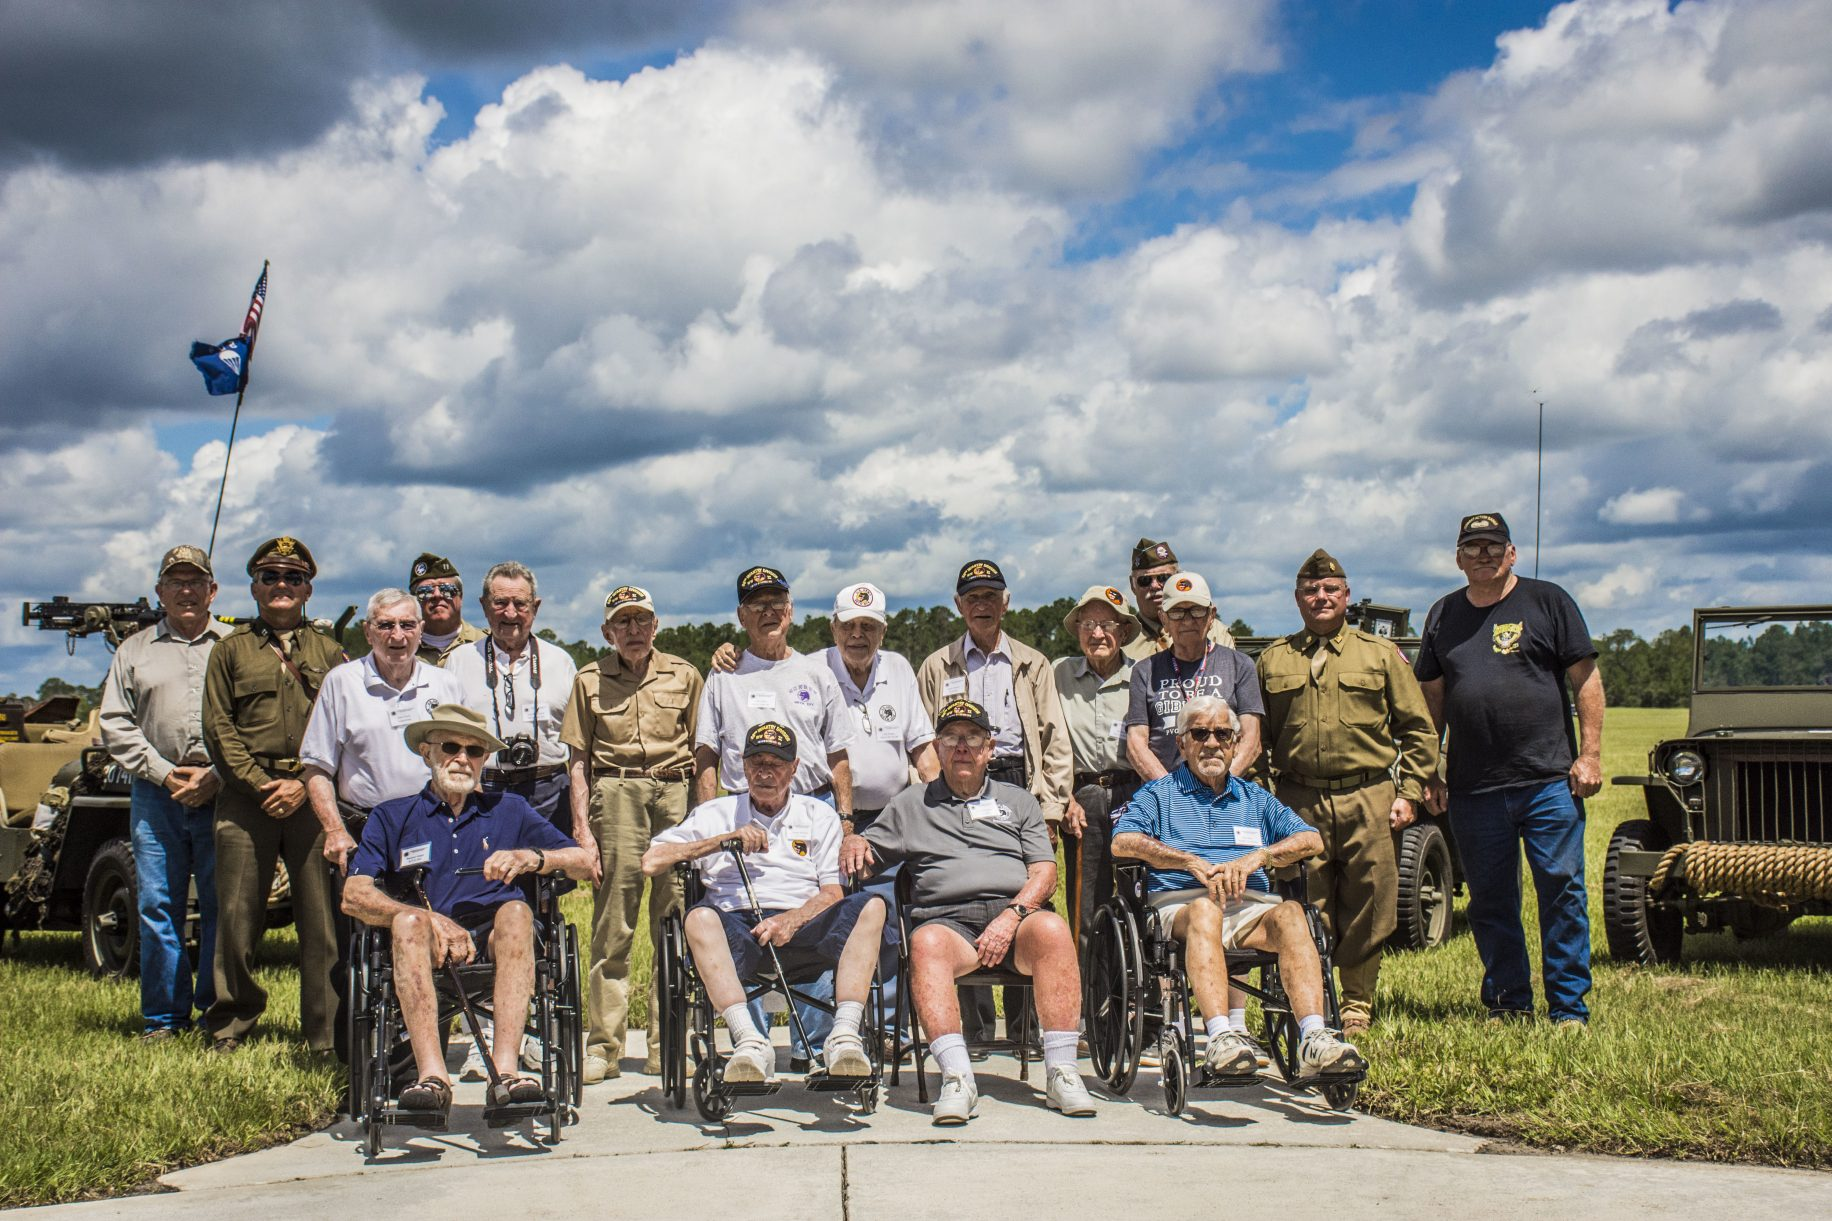 3 Men Walk 100 Miles To Raise Money For Veterans Featured